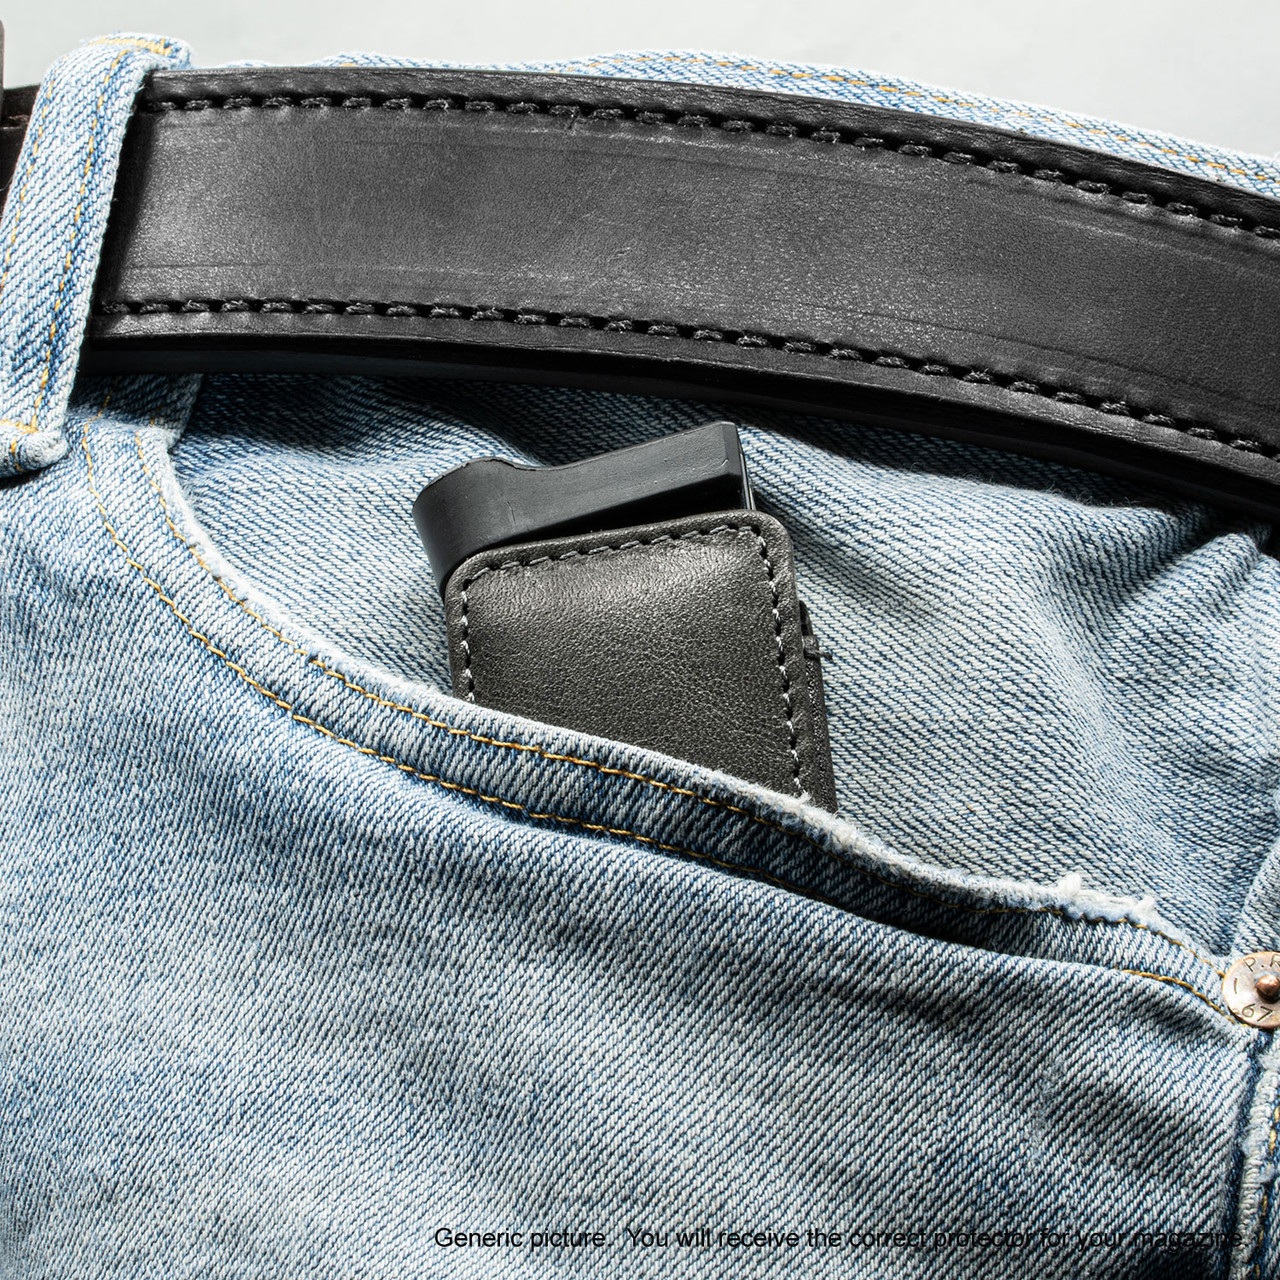 S&W SW9V Black Freedom Magazine Pocket Protector